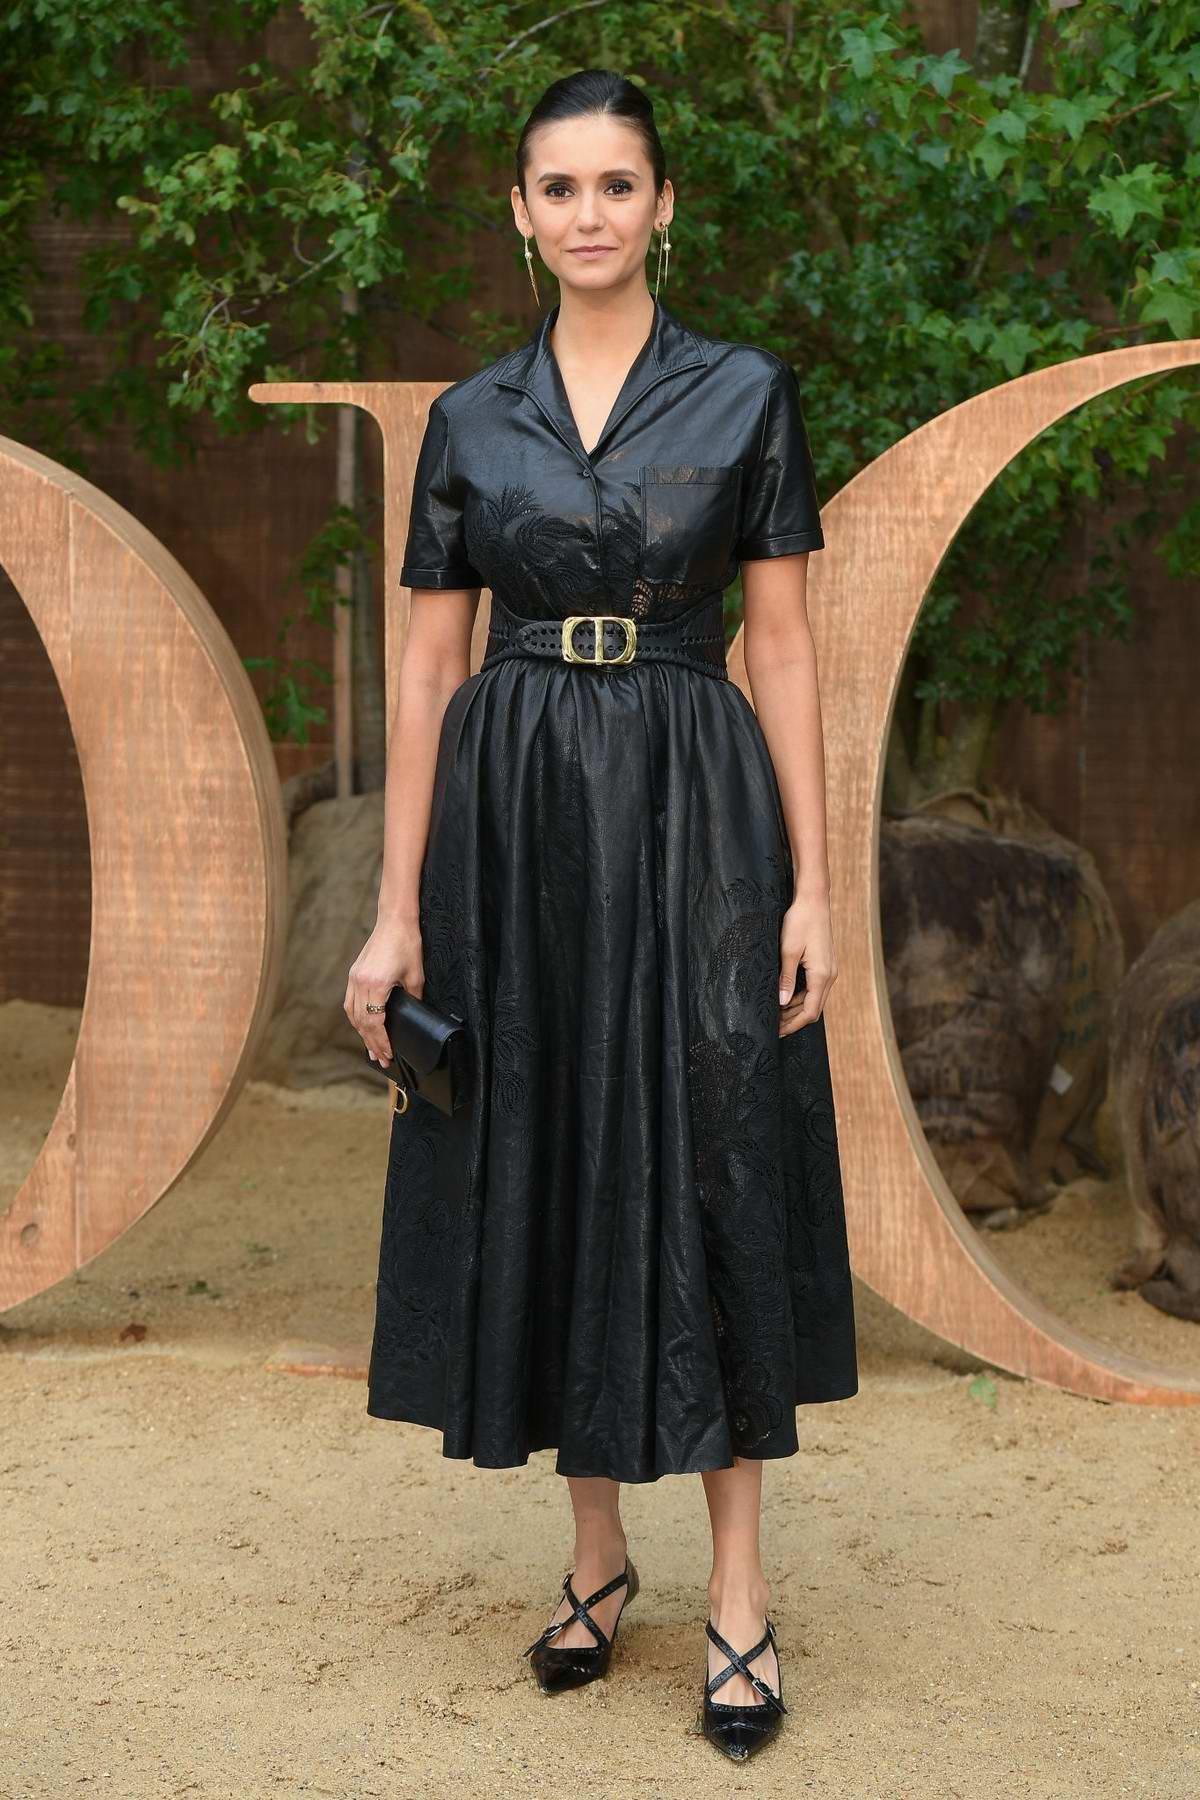 Nina Dobrev attends Christian Dior show, Womenswear SS 2020 during Paris Fashion Week in Paris, France